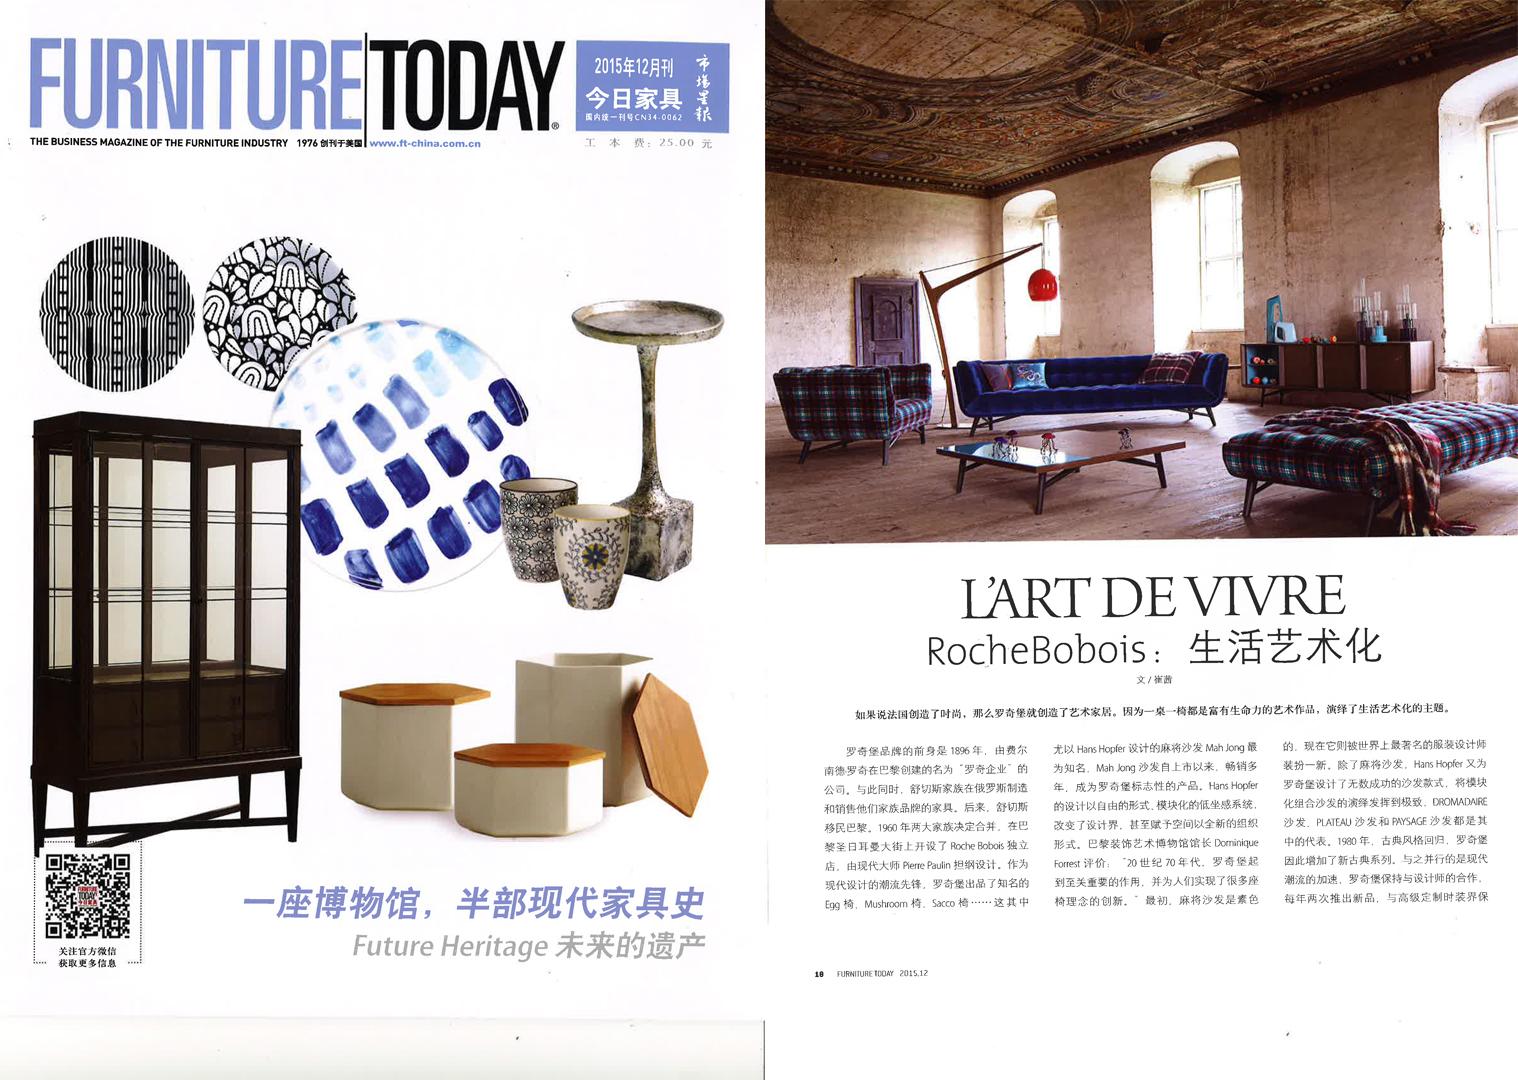 furniture design - dicembre 2015